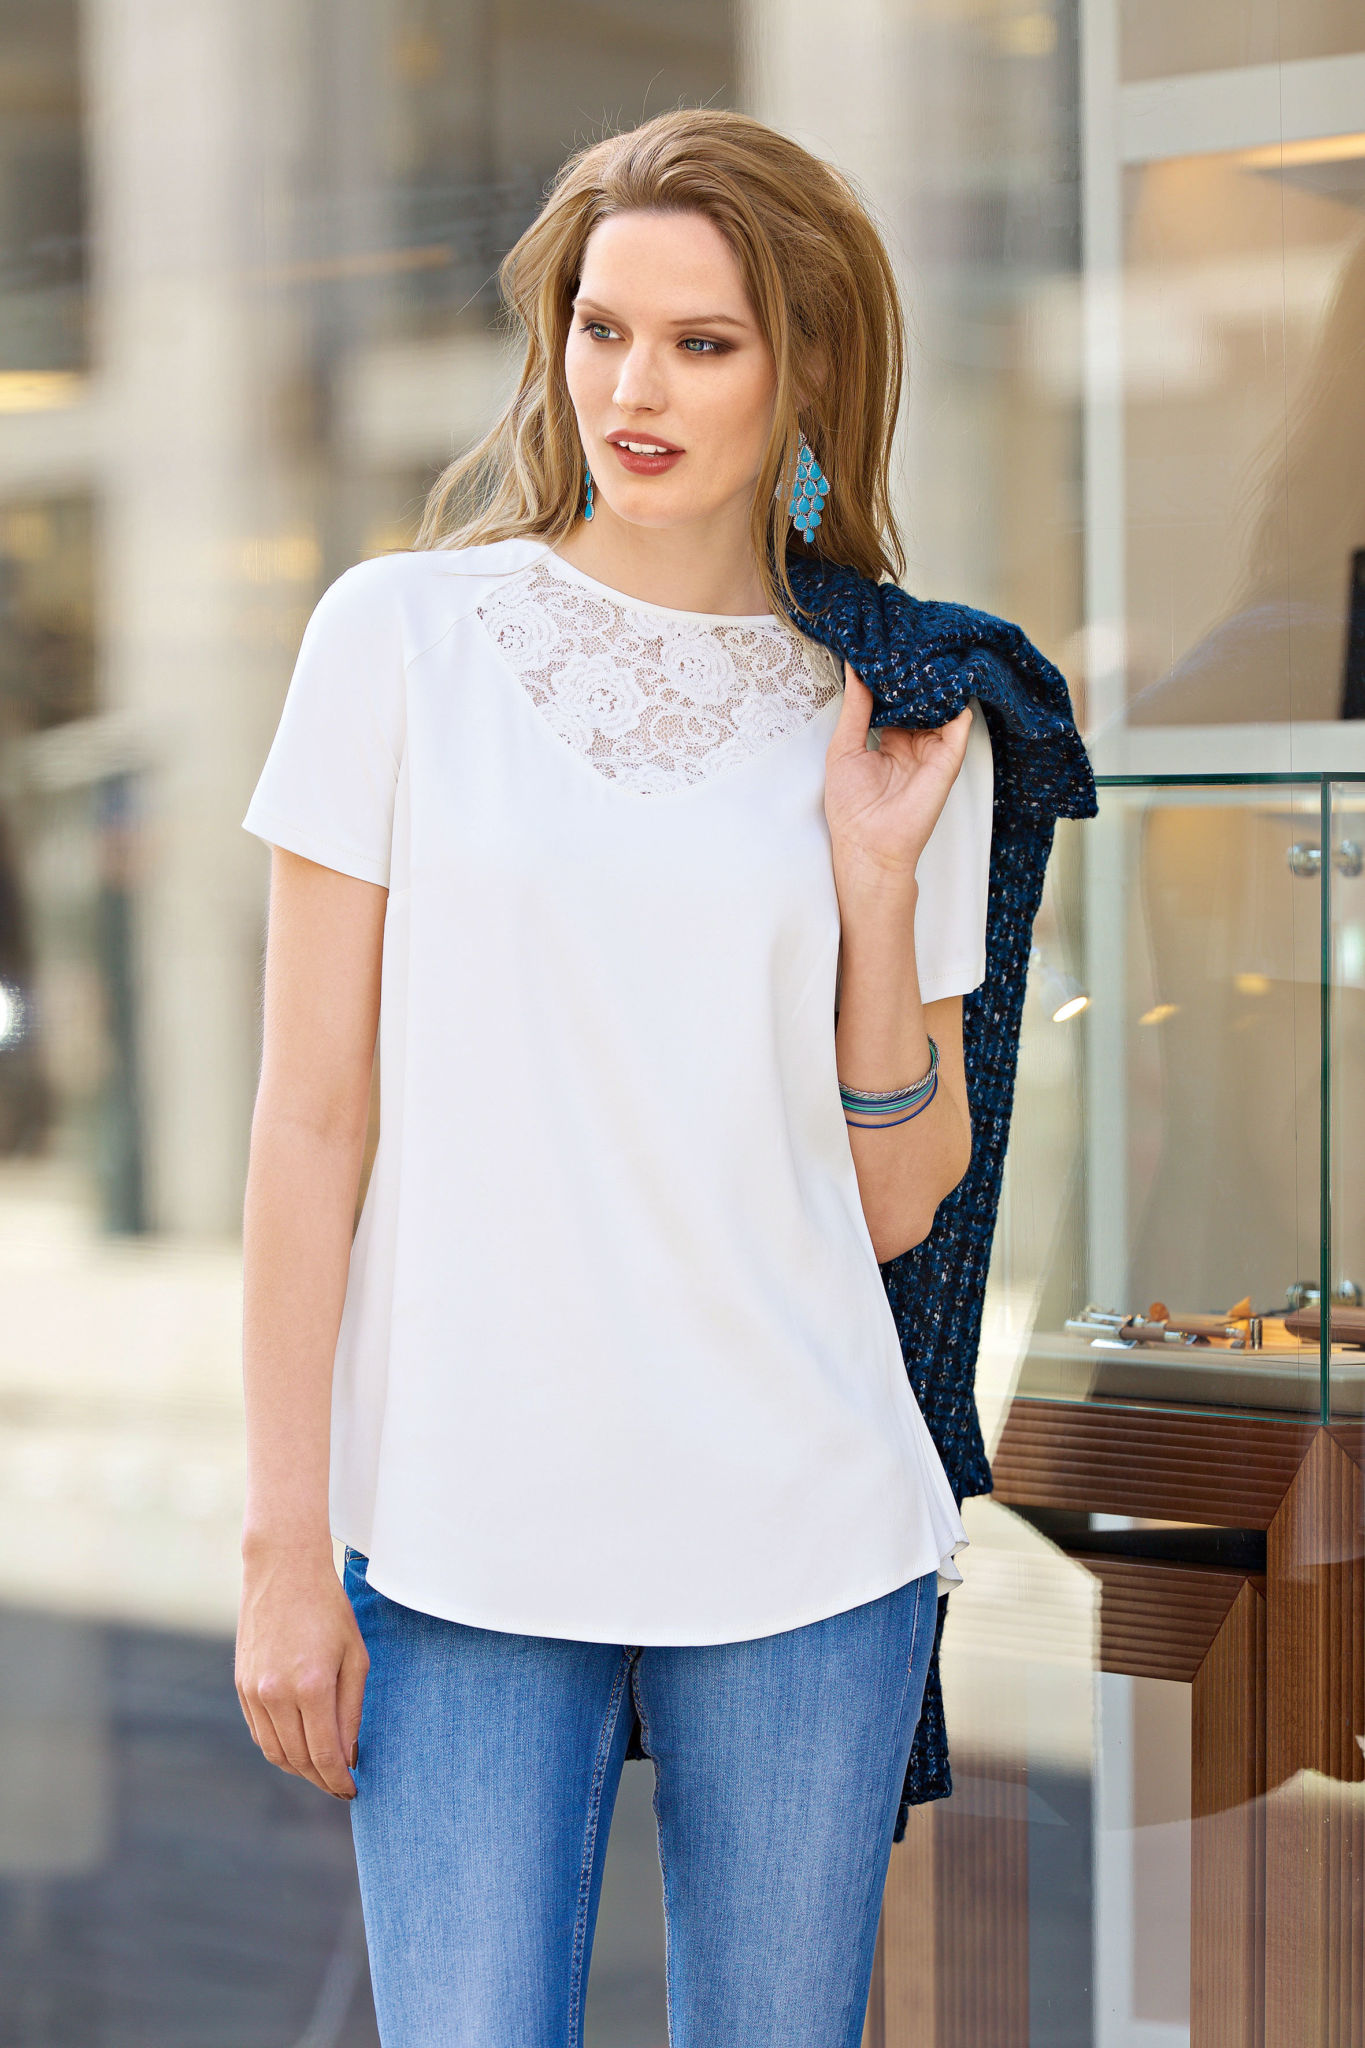 мода весна лето 2018 для женщин за 30: белая блузка с коротким рукавом